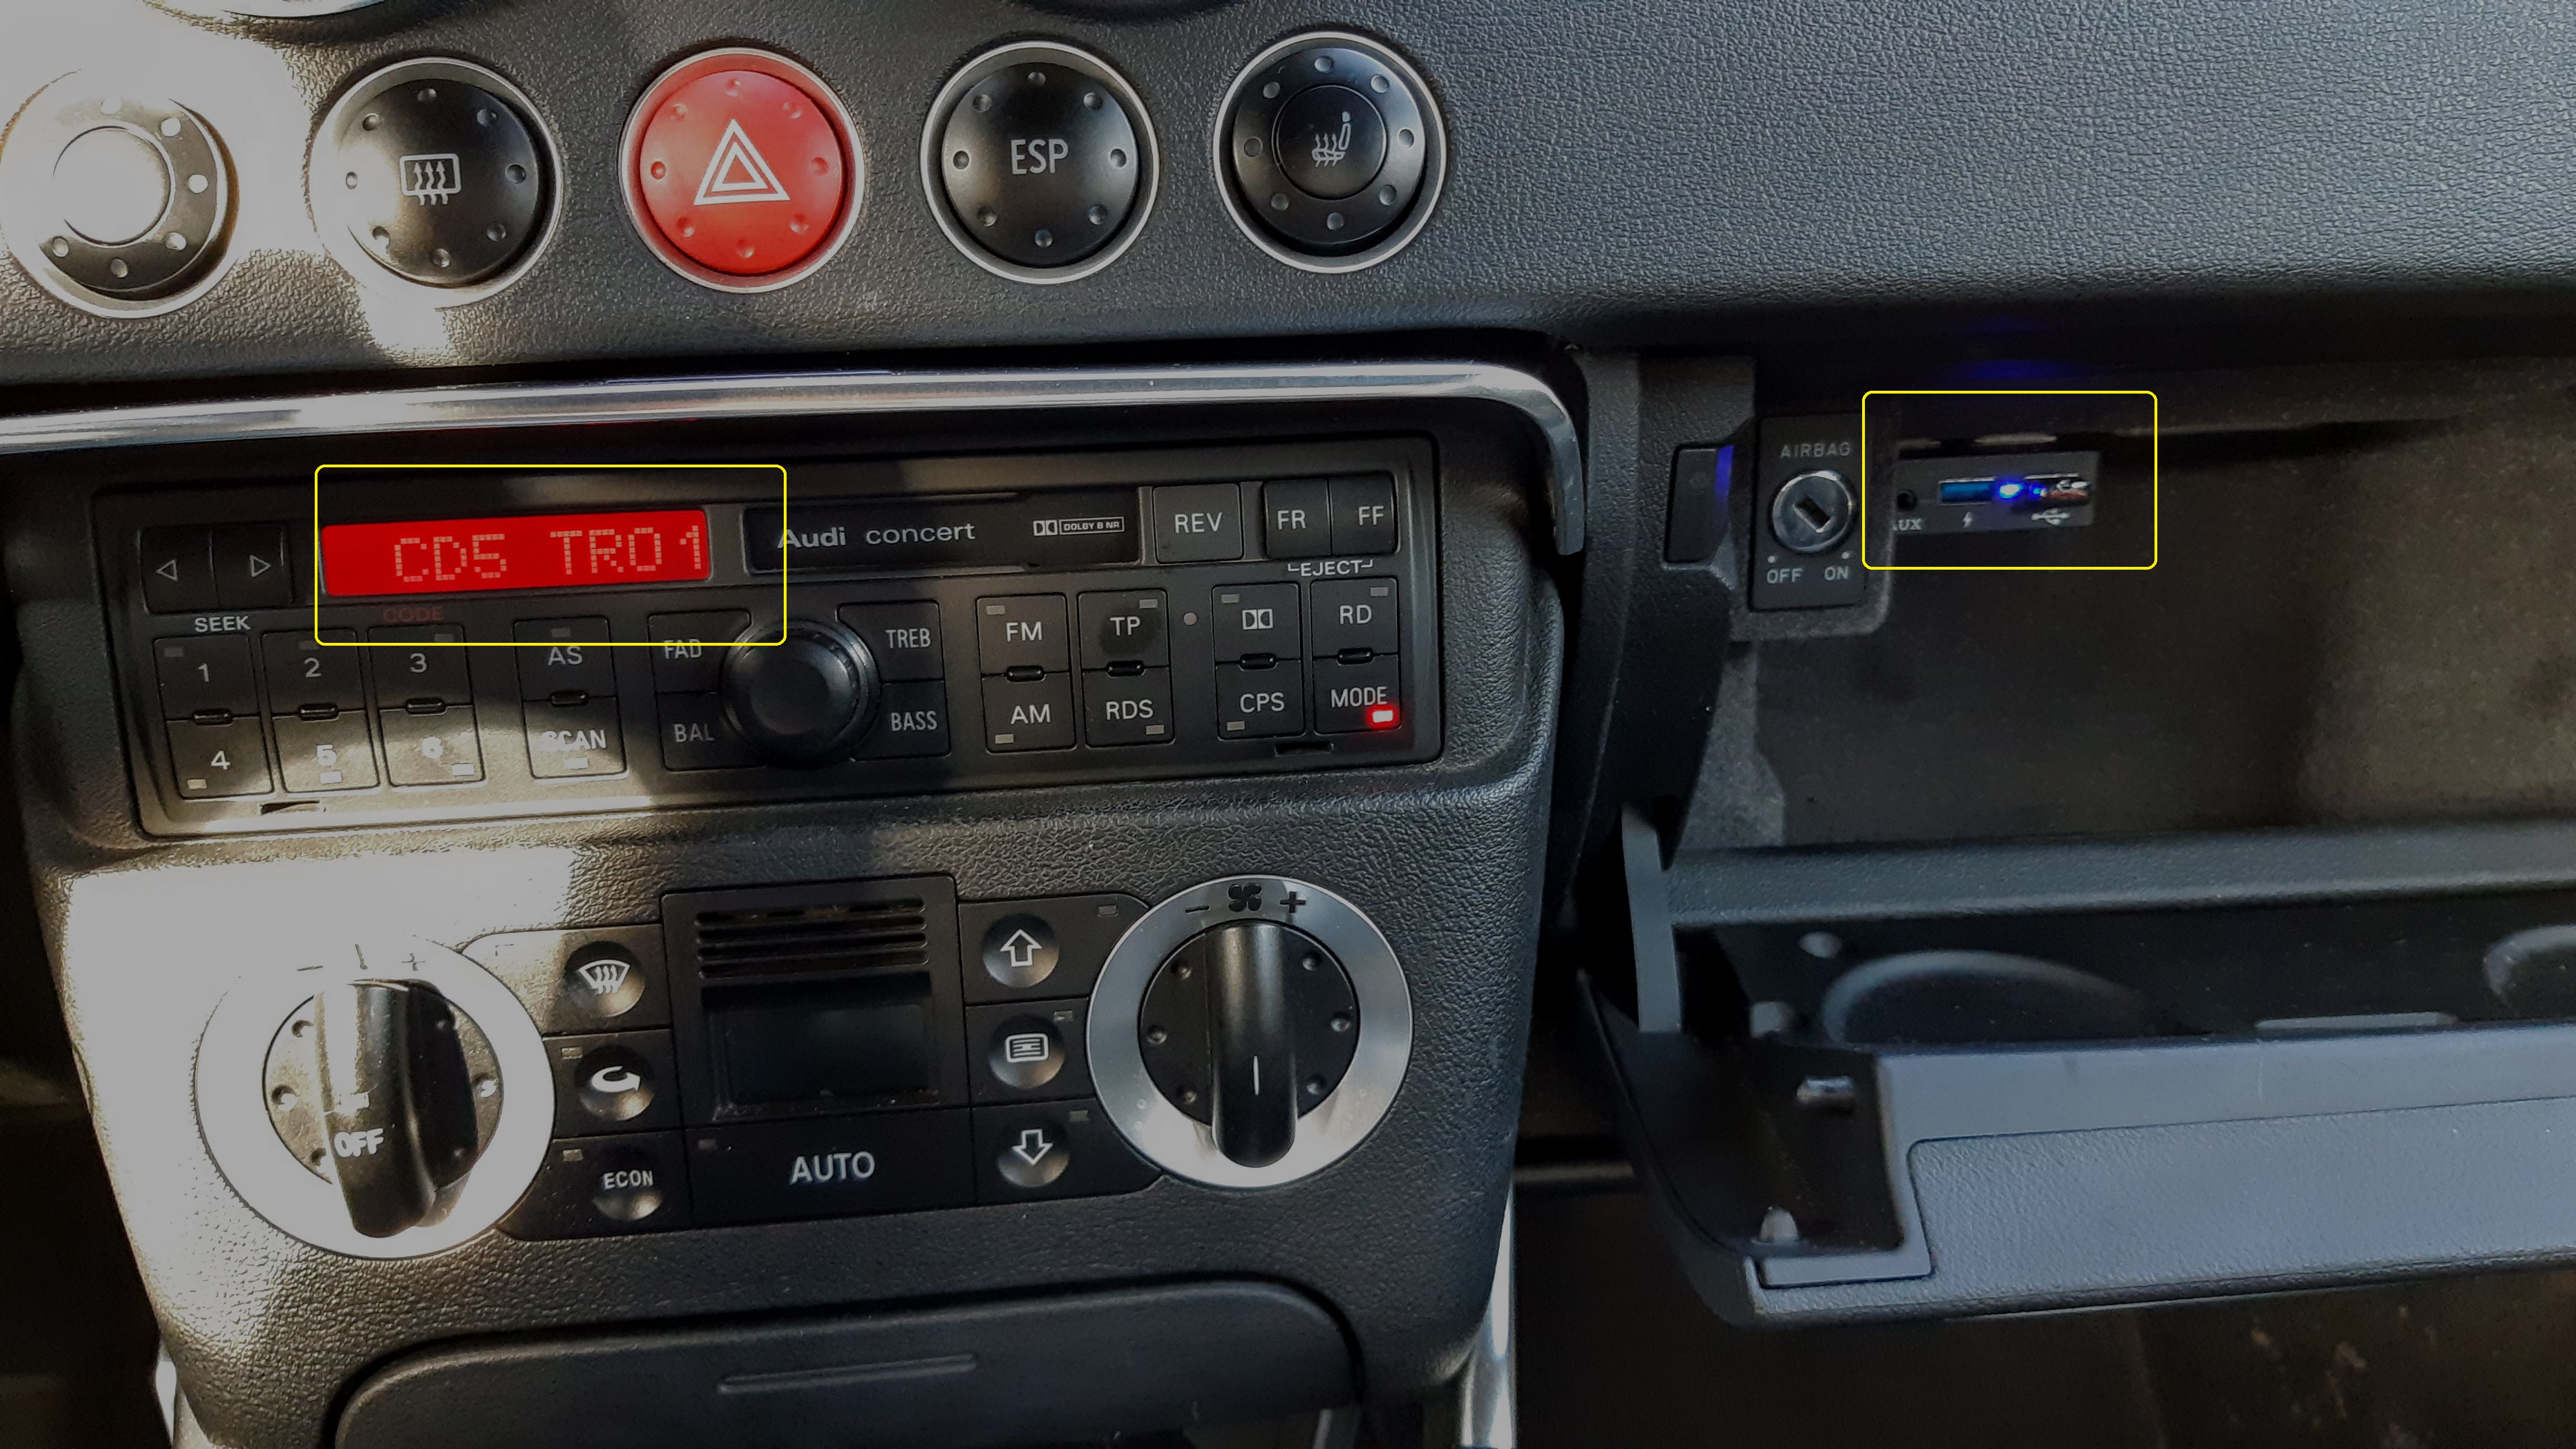 Bluetooth / USB / AUX interface / audio adapter voor SEAT autoradio's (8-pin)